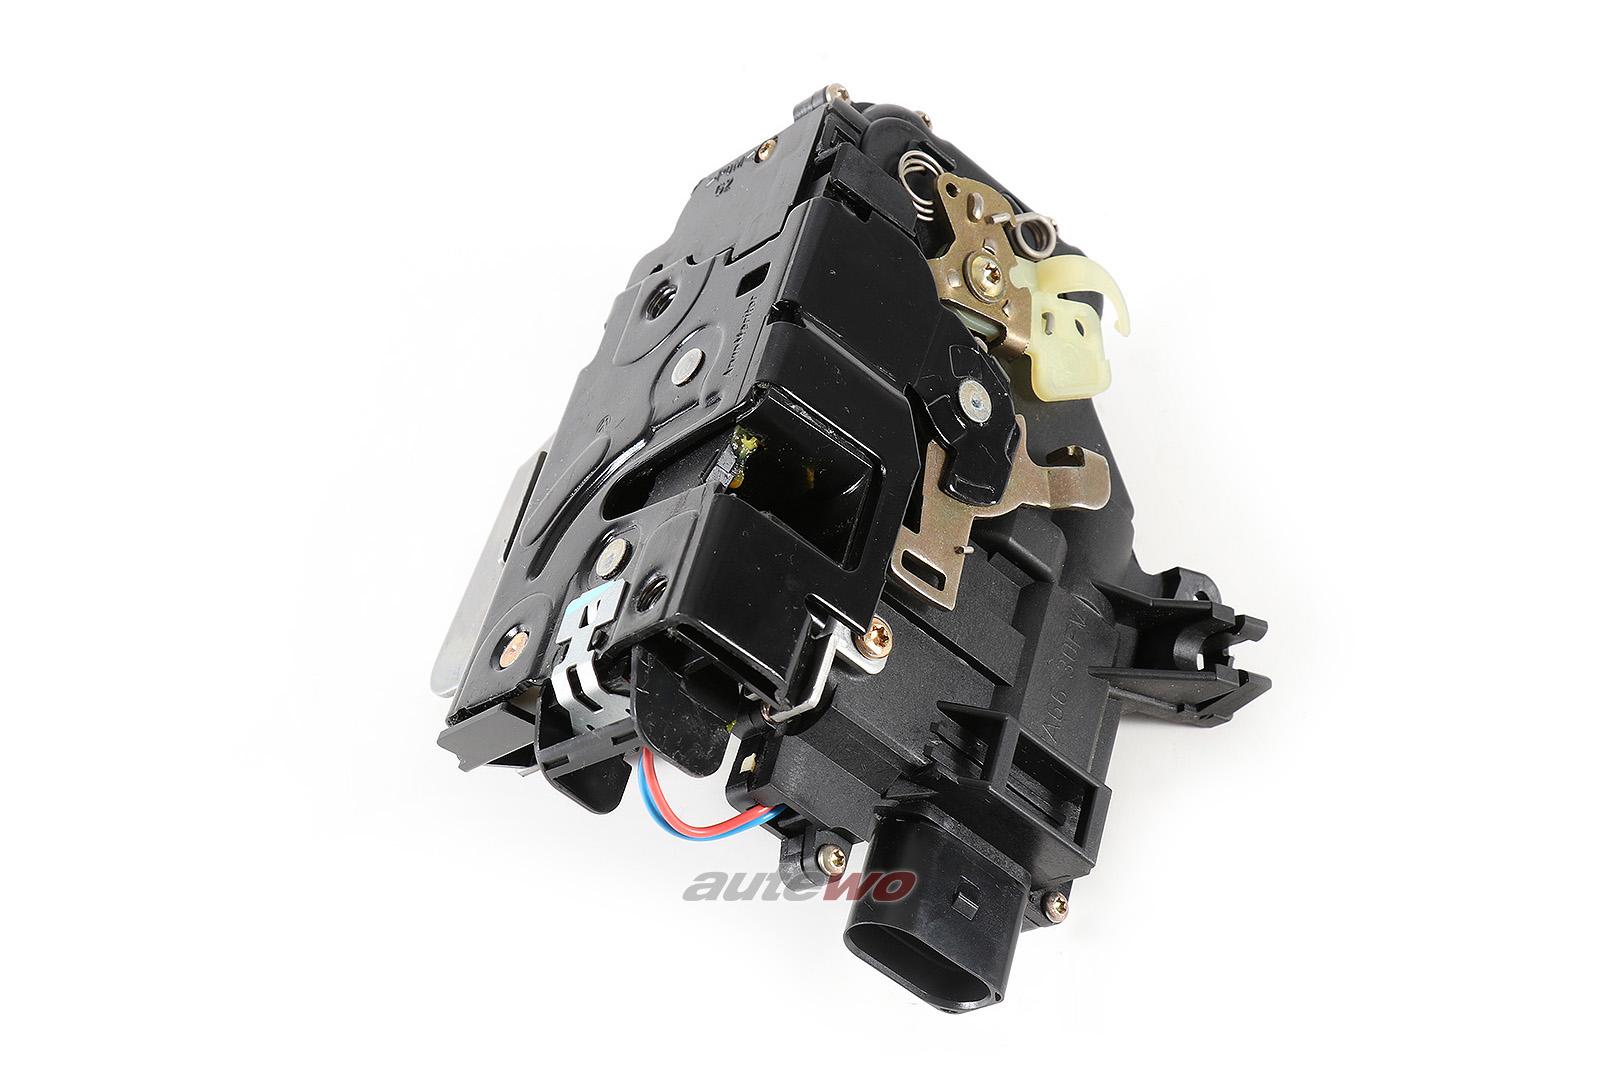 4B1837015G NEU Audi A4/S4 8E/B6/A6/S6/Allroad 4B Türschloss Vorne Links